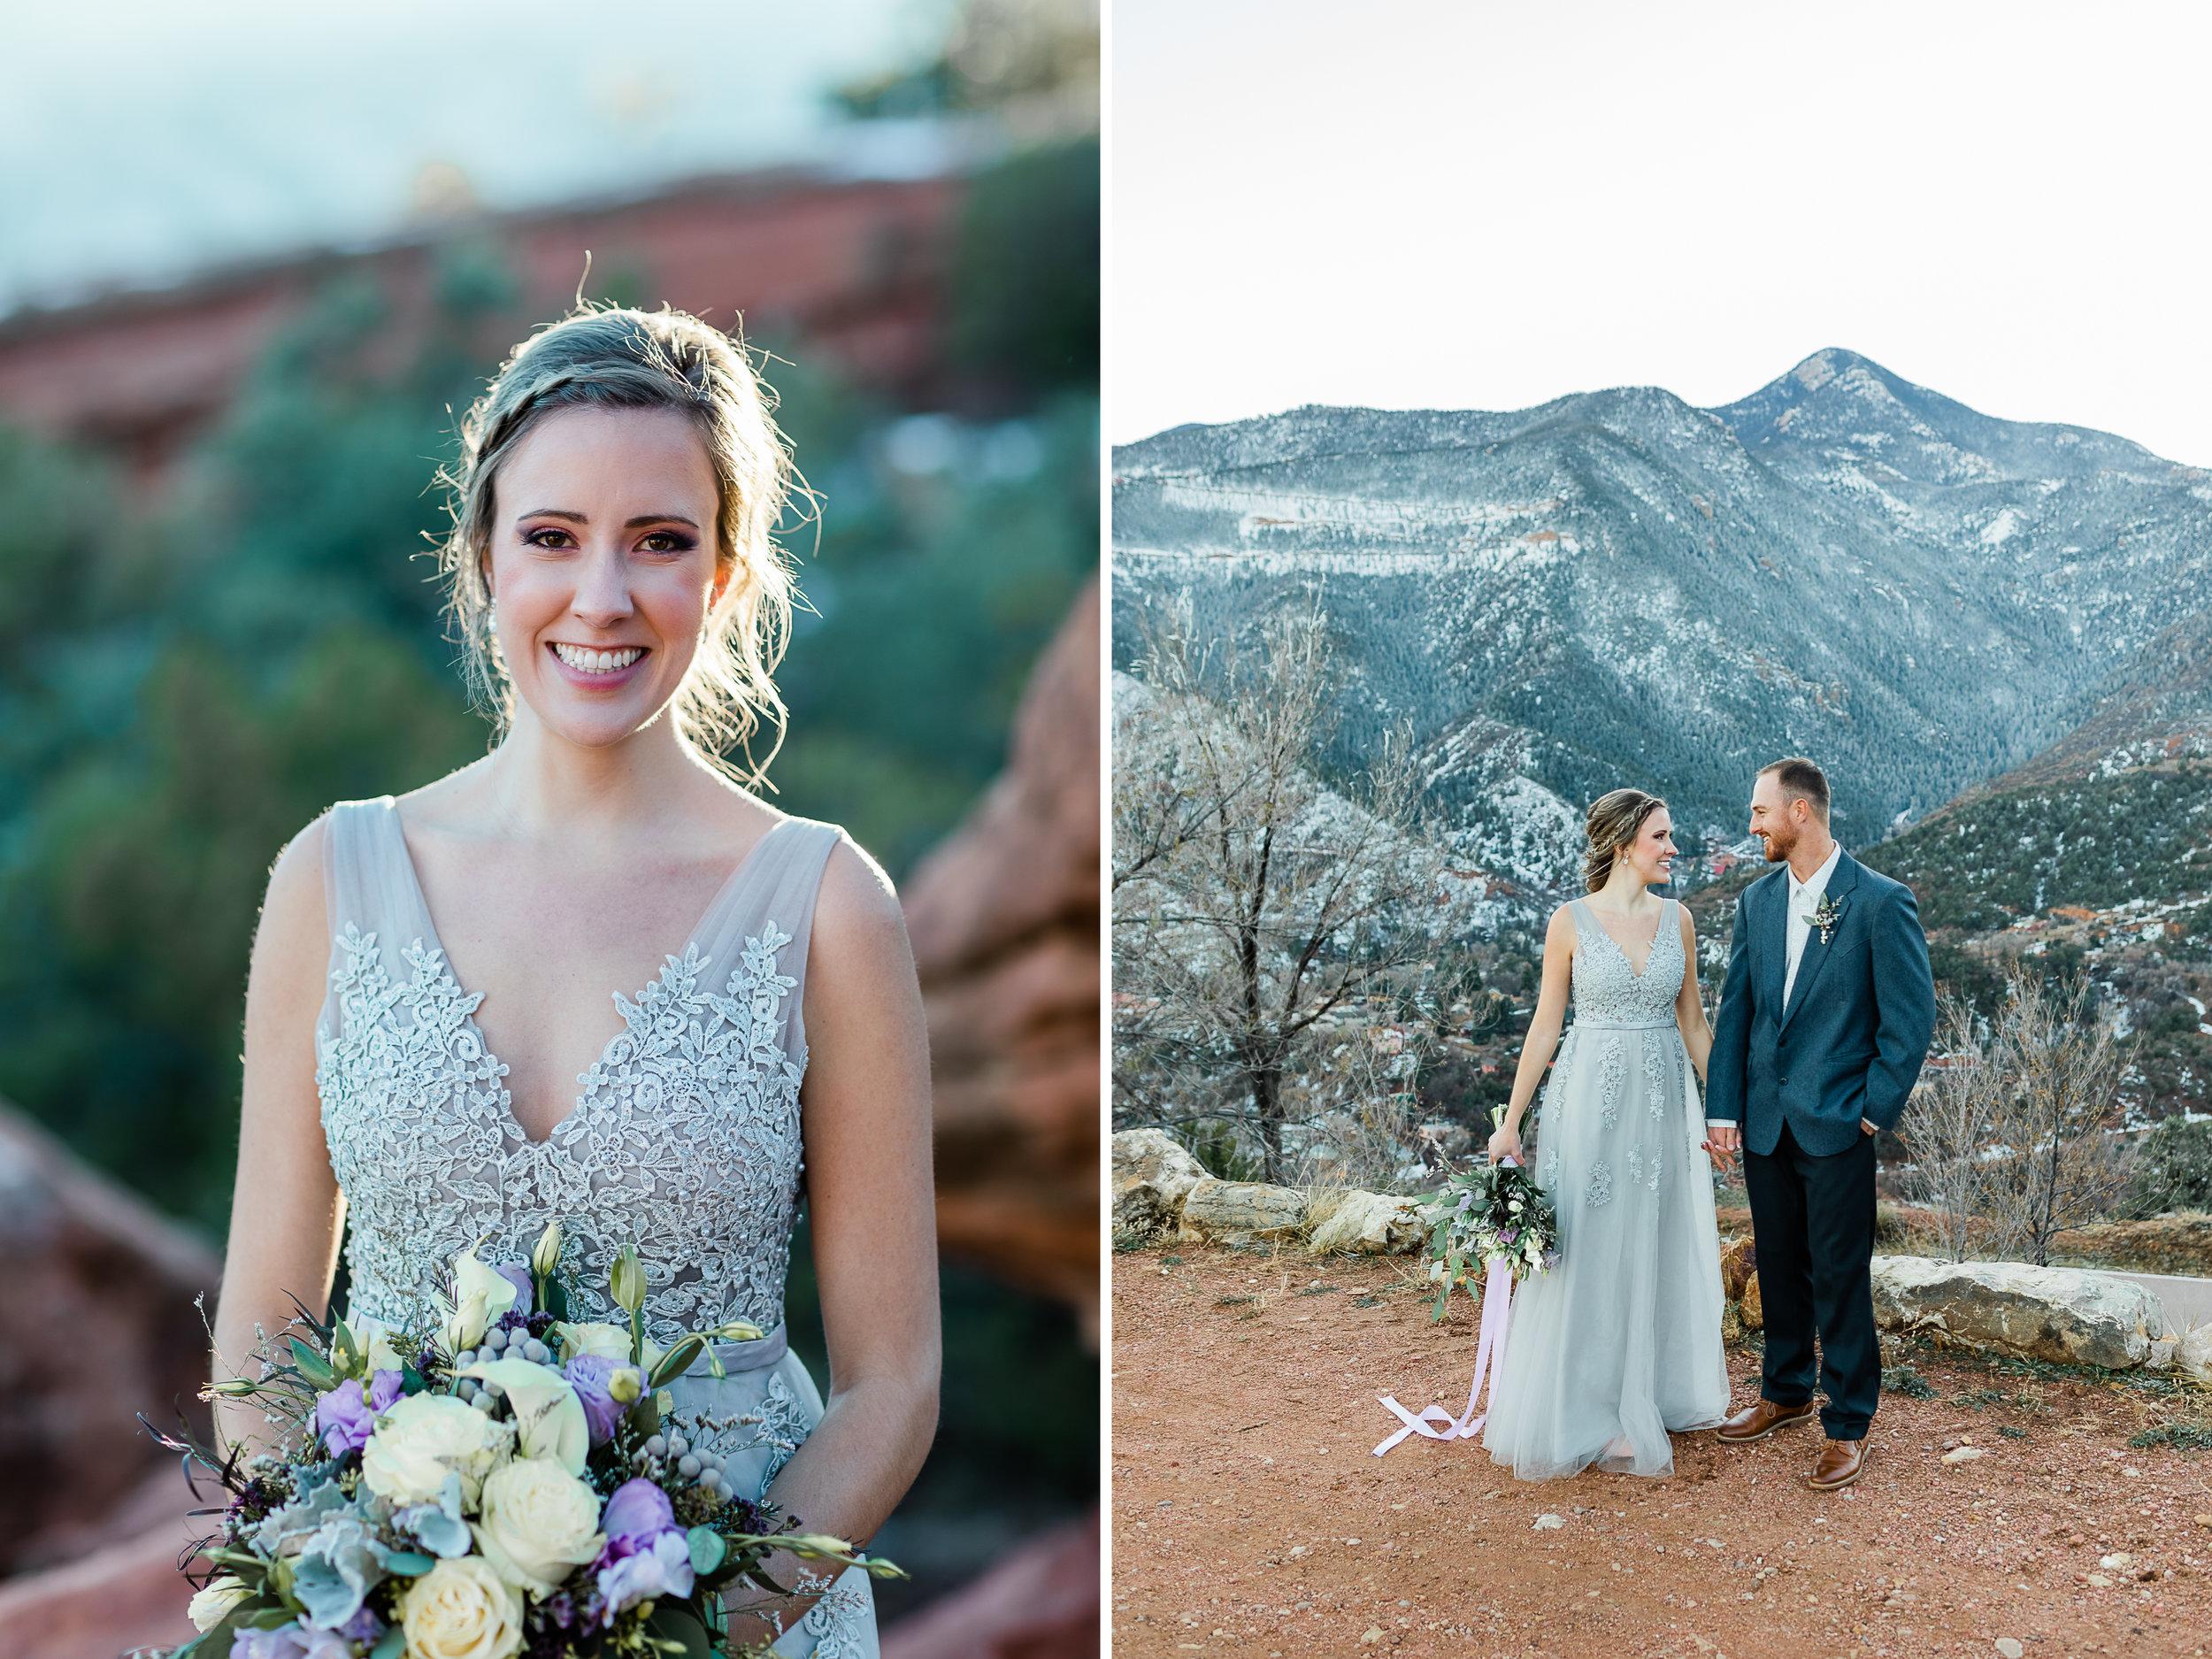 Colorado Springs Wedding Photographer 14.jpg